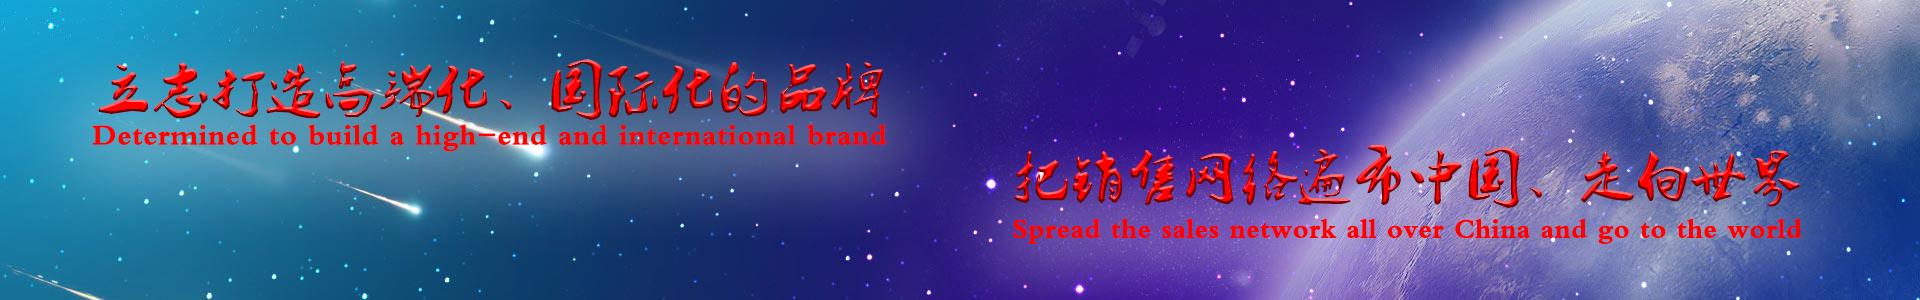 http://www.tianyangwood.com/data/upload/202007/20200723153959_338.jpg